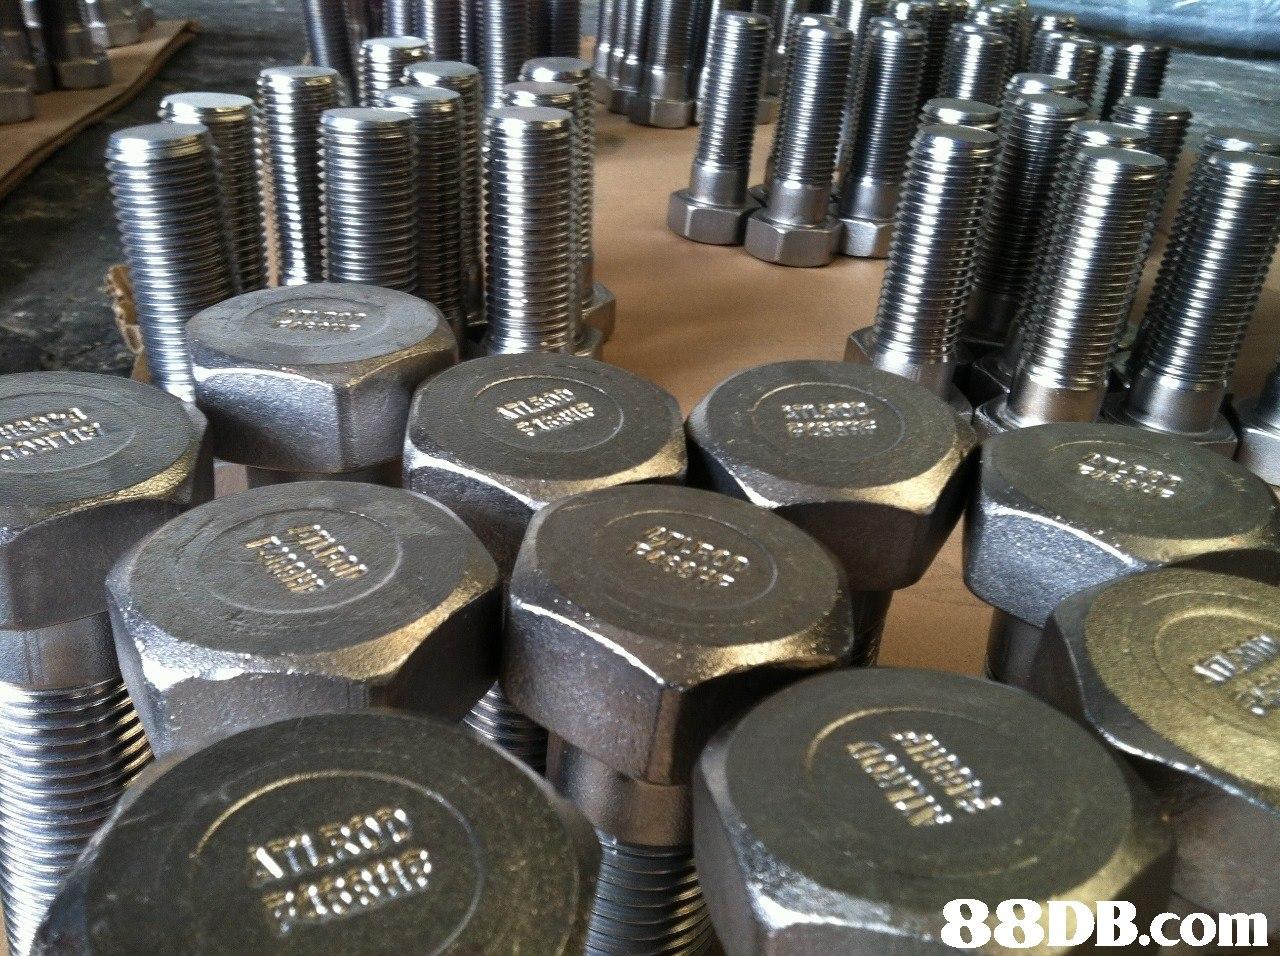 hardware,metal,product,